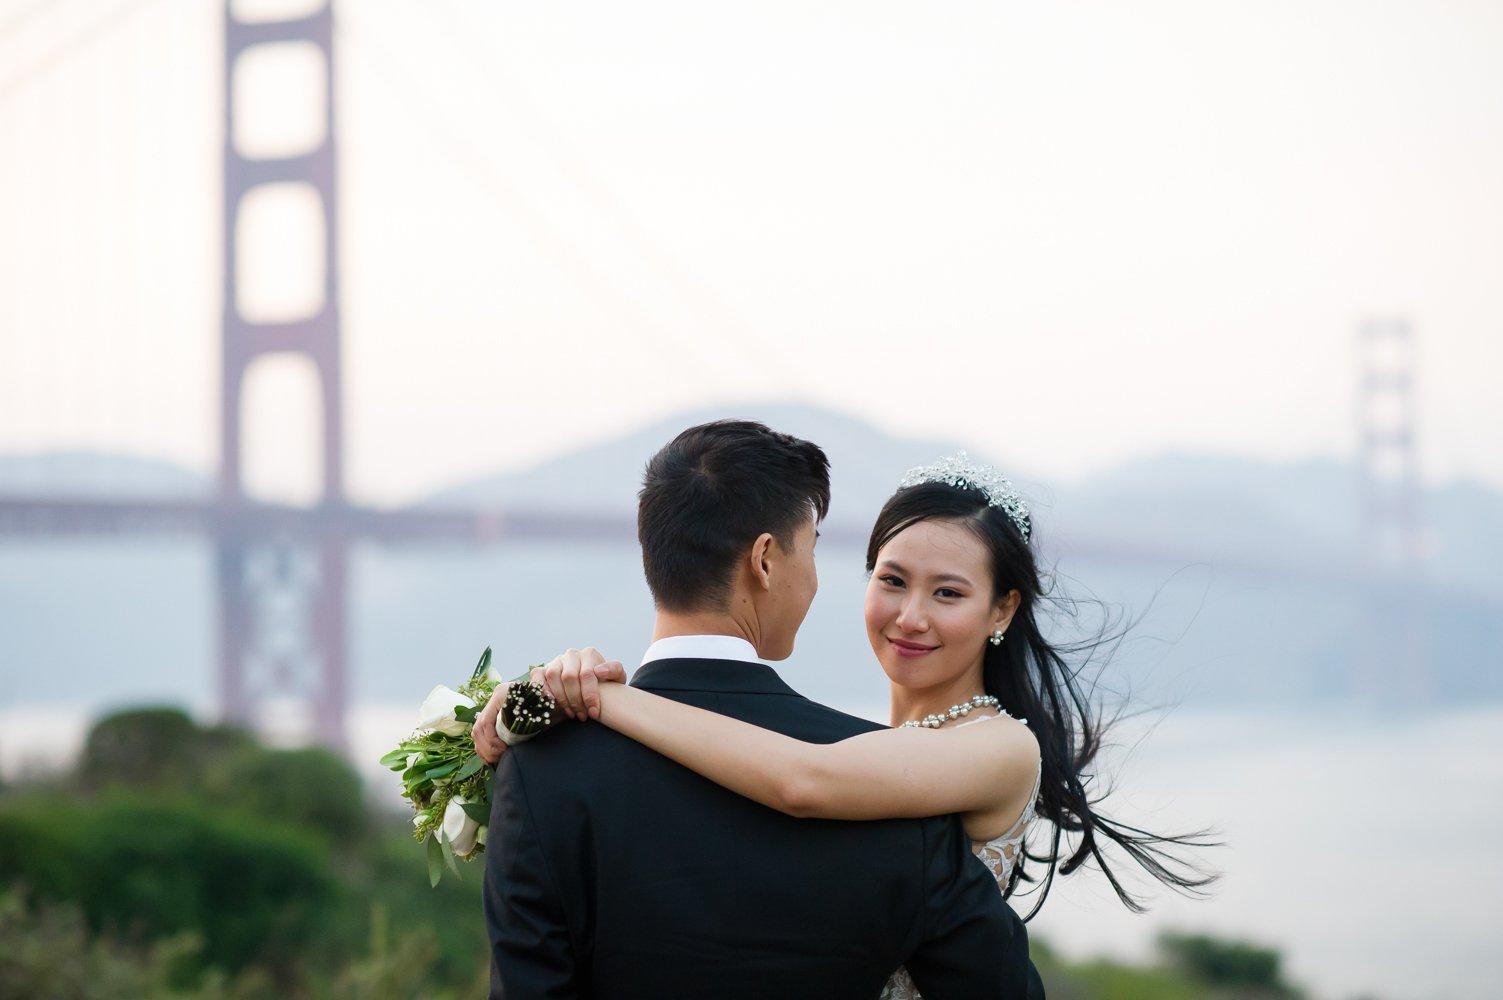 Chloe-Jackman-Photography-SF-Elopement-Golden-Gate-Bridge-2017-453